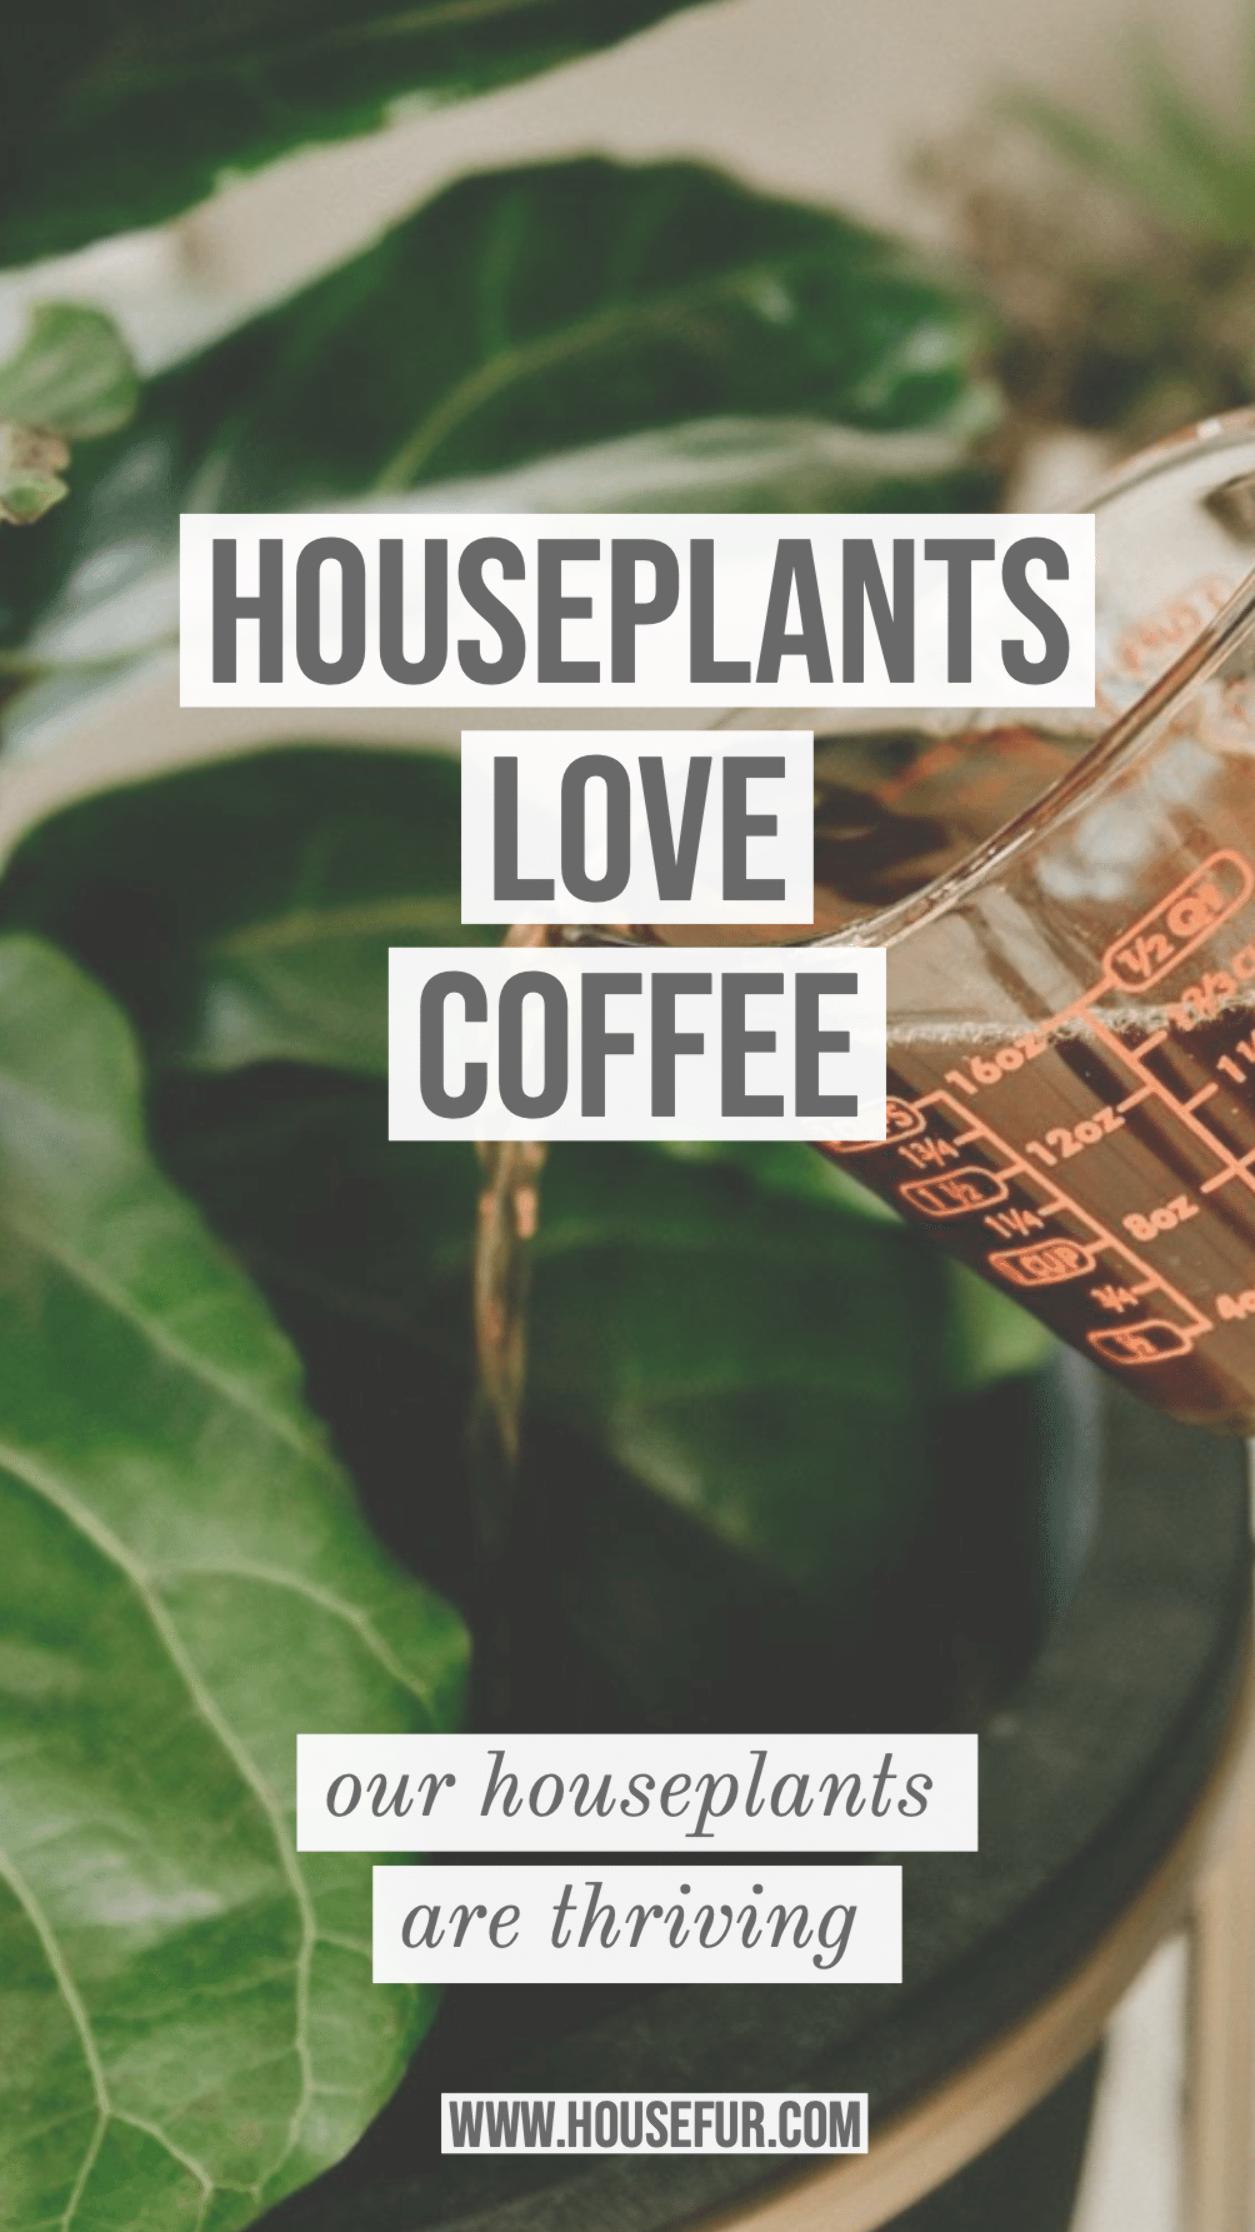 Houseplants Love Coffee As A Natural Fertilizer Plants 400 x 300